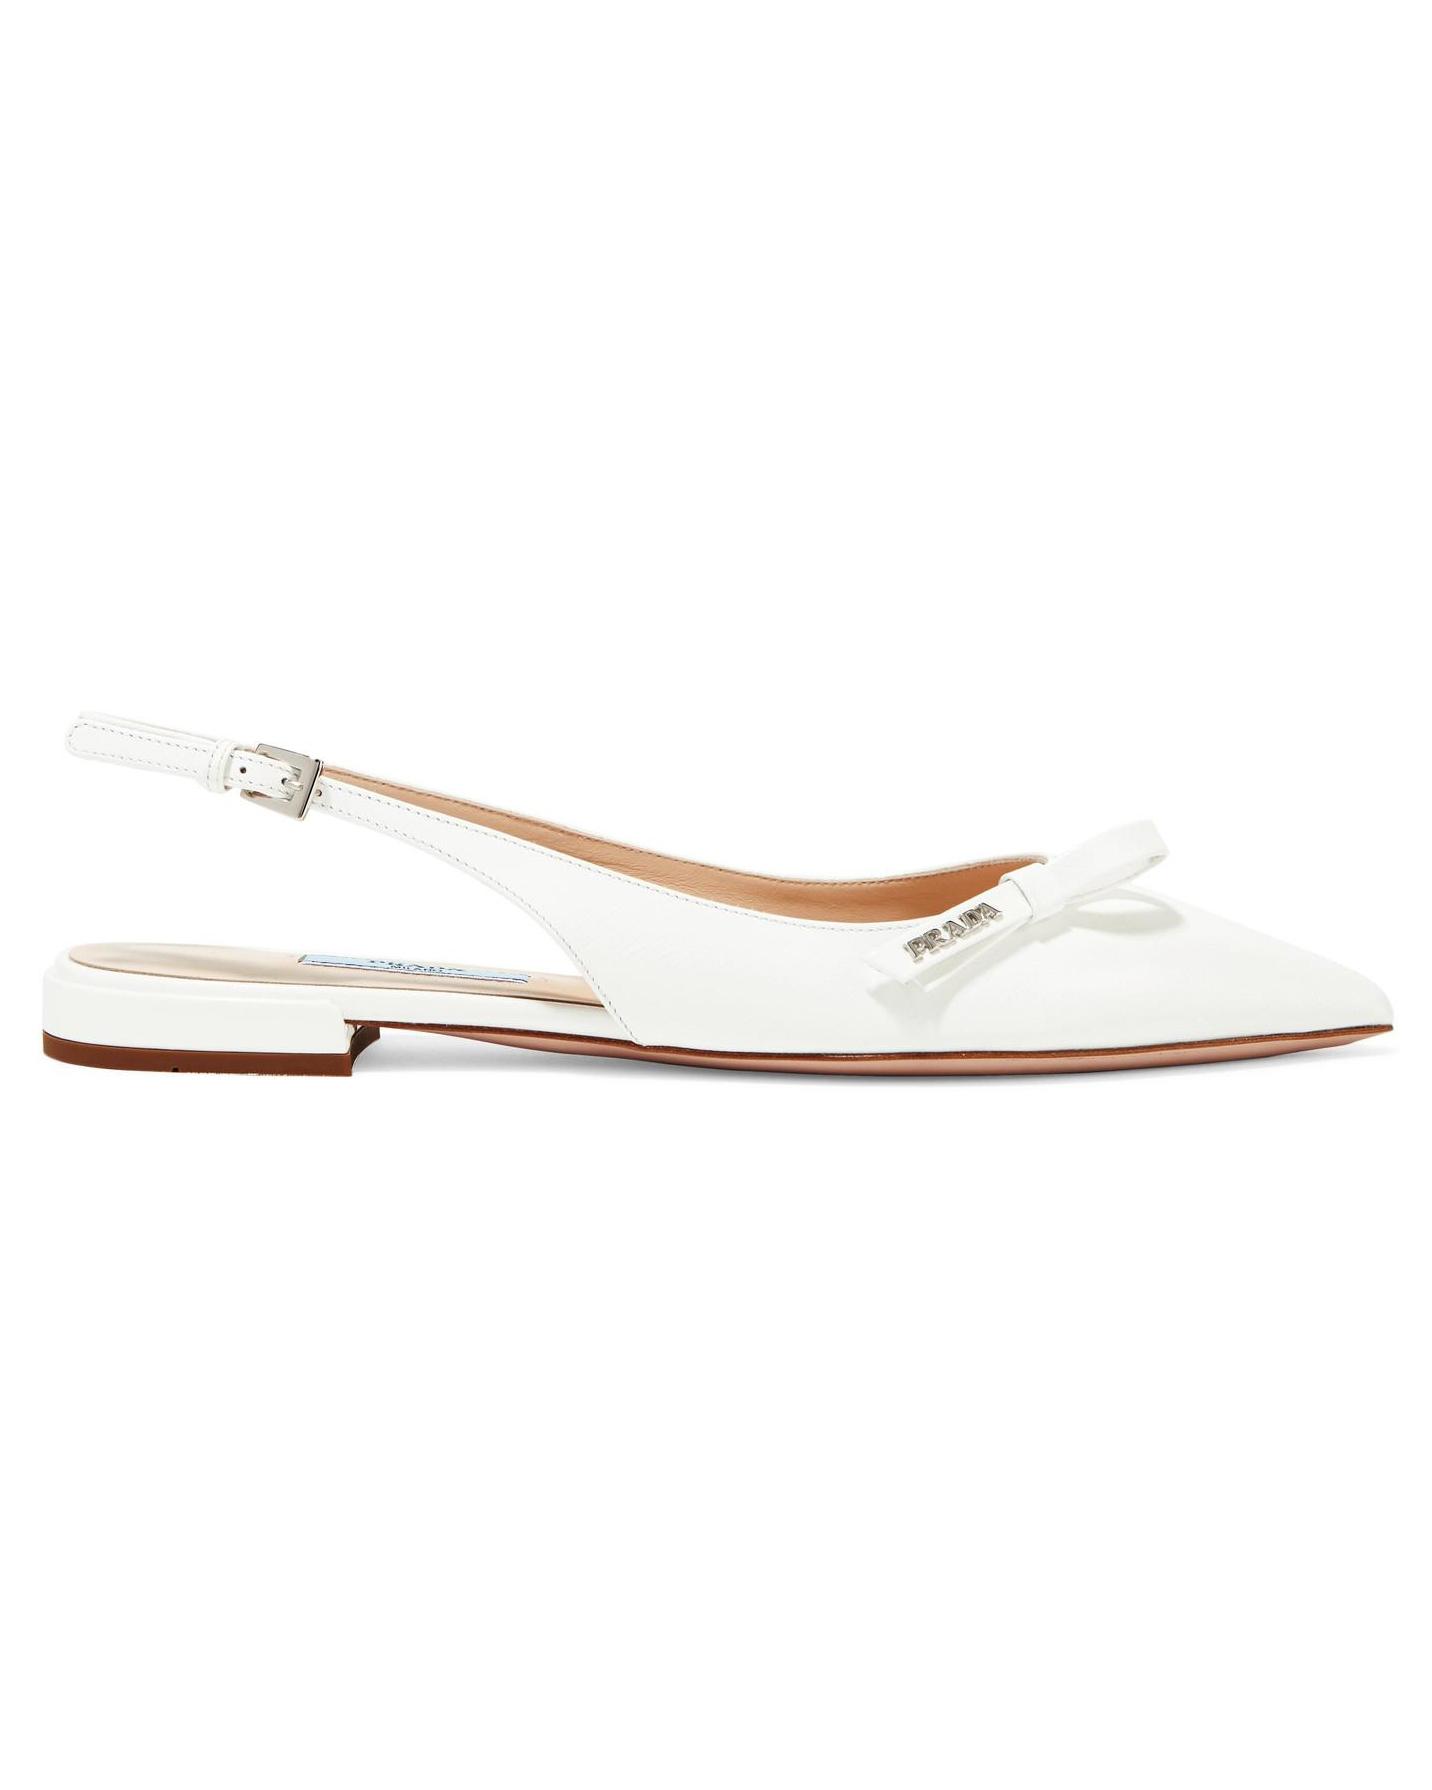 outdoor wedding shoes leather bow-embellished sling-back flats